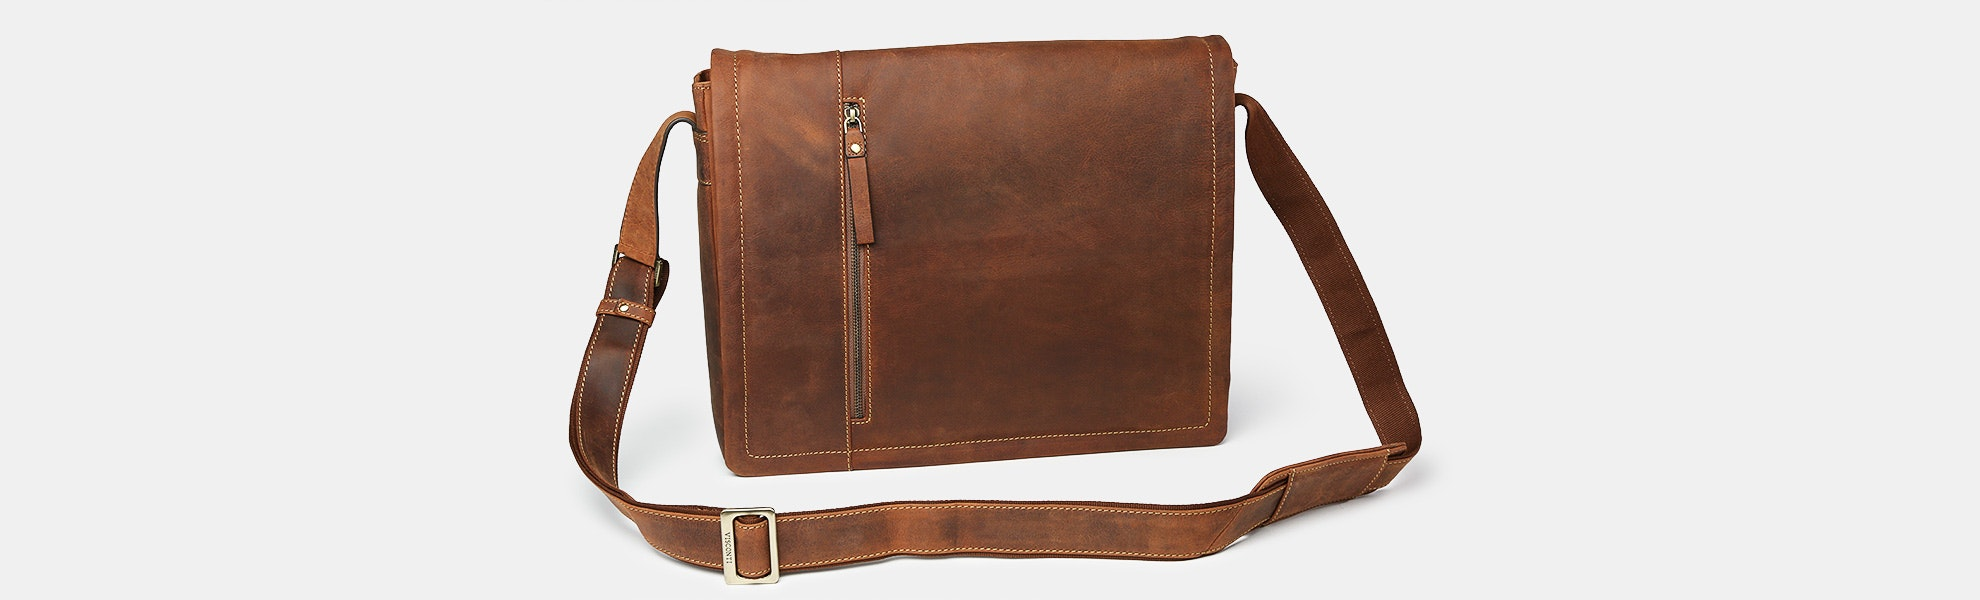 Visconti Foster Leather Laptop Messenger Bag